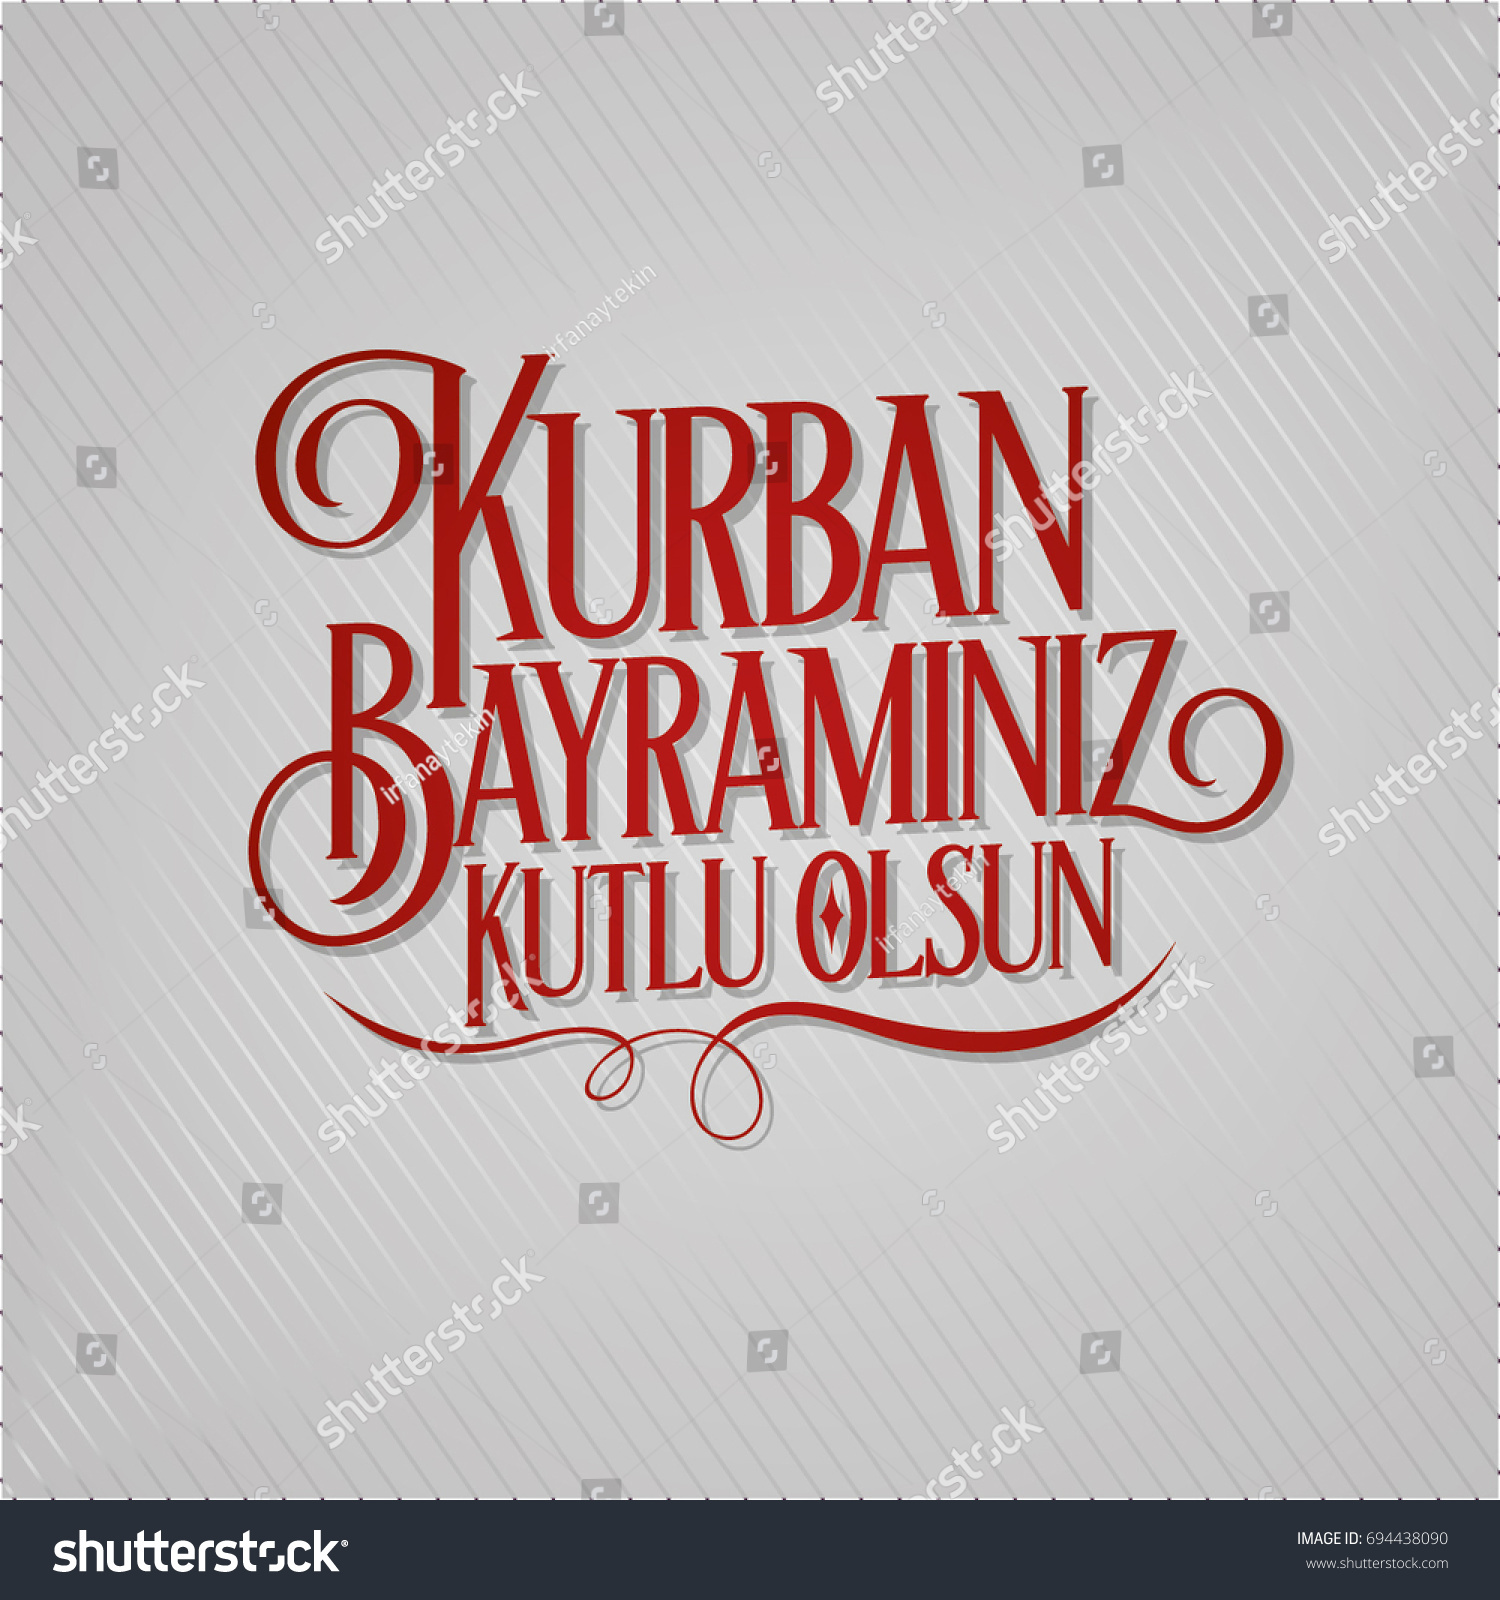 Feast sacrifice greeting turkish kurban bayraminiz stock photo feast of the sacrifice greeting turkish kurban bayraminiz kutlu olsun qurban m4hsunfo